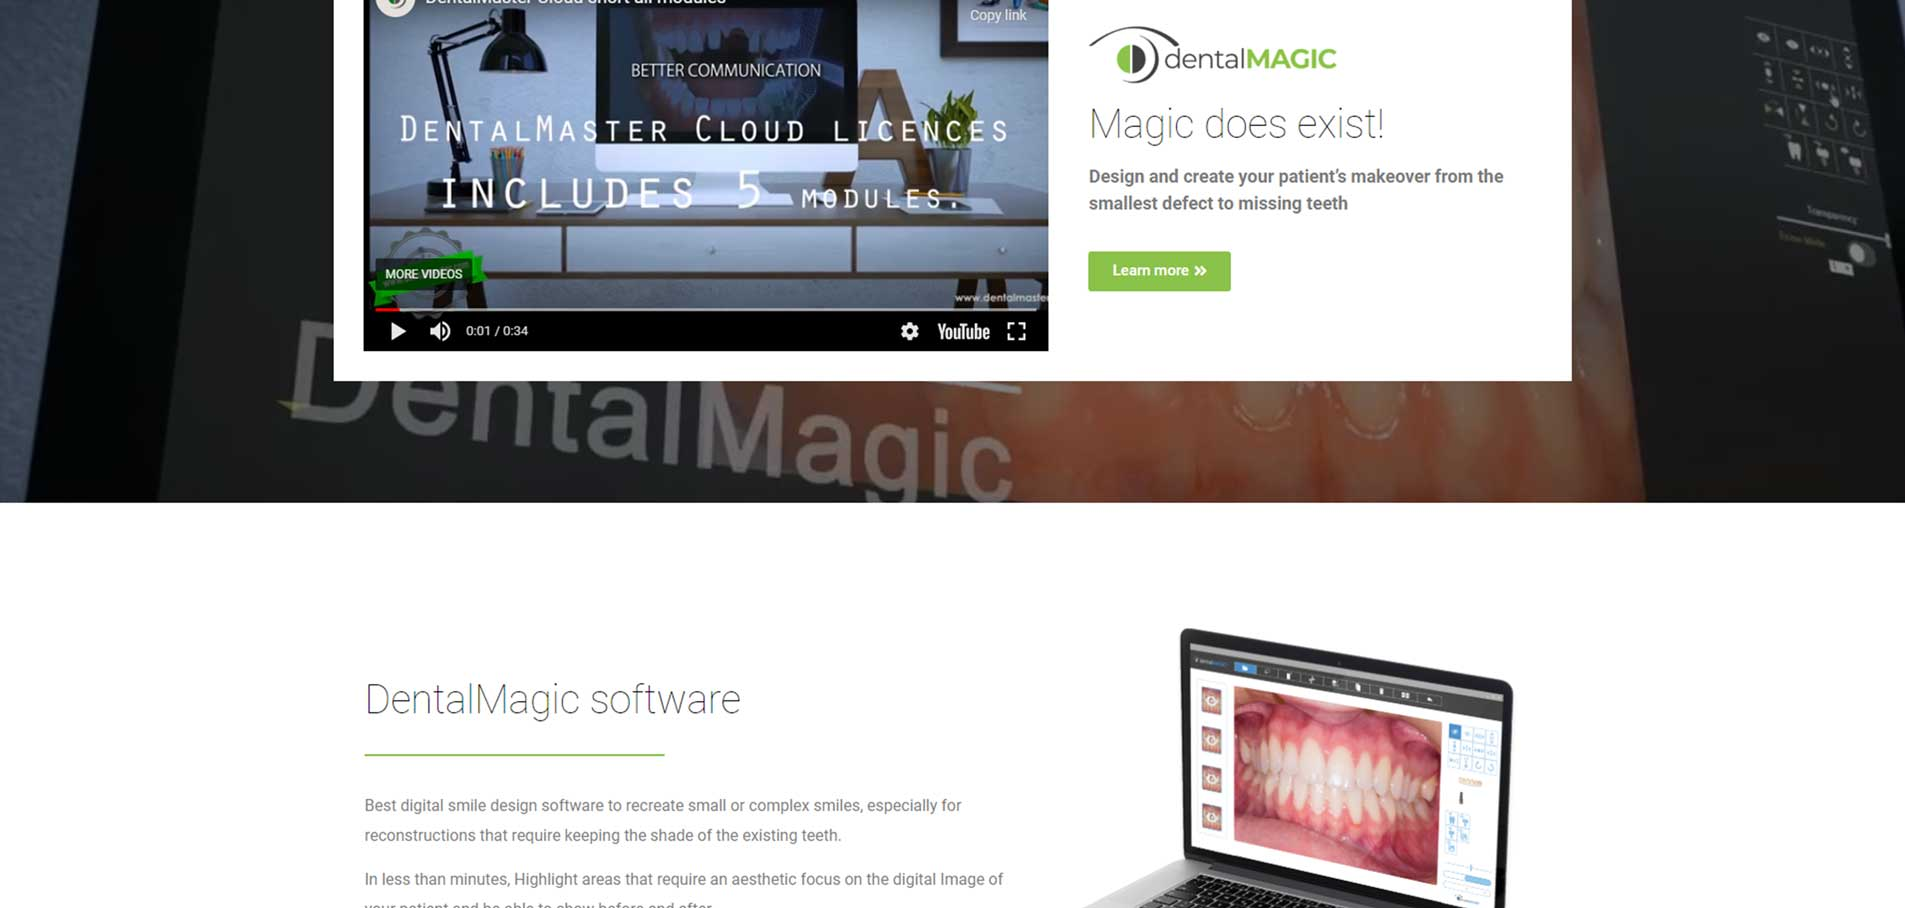 IDentalMagic-website